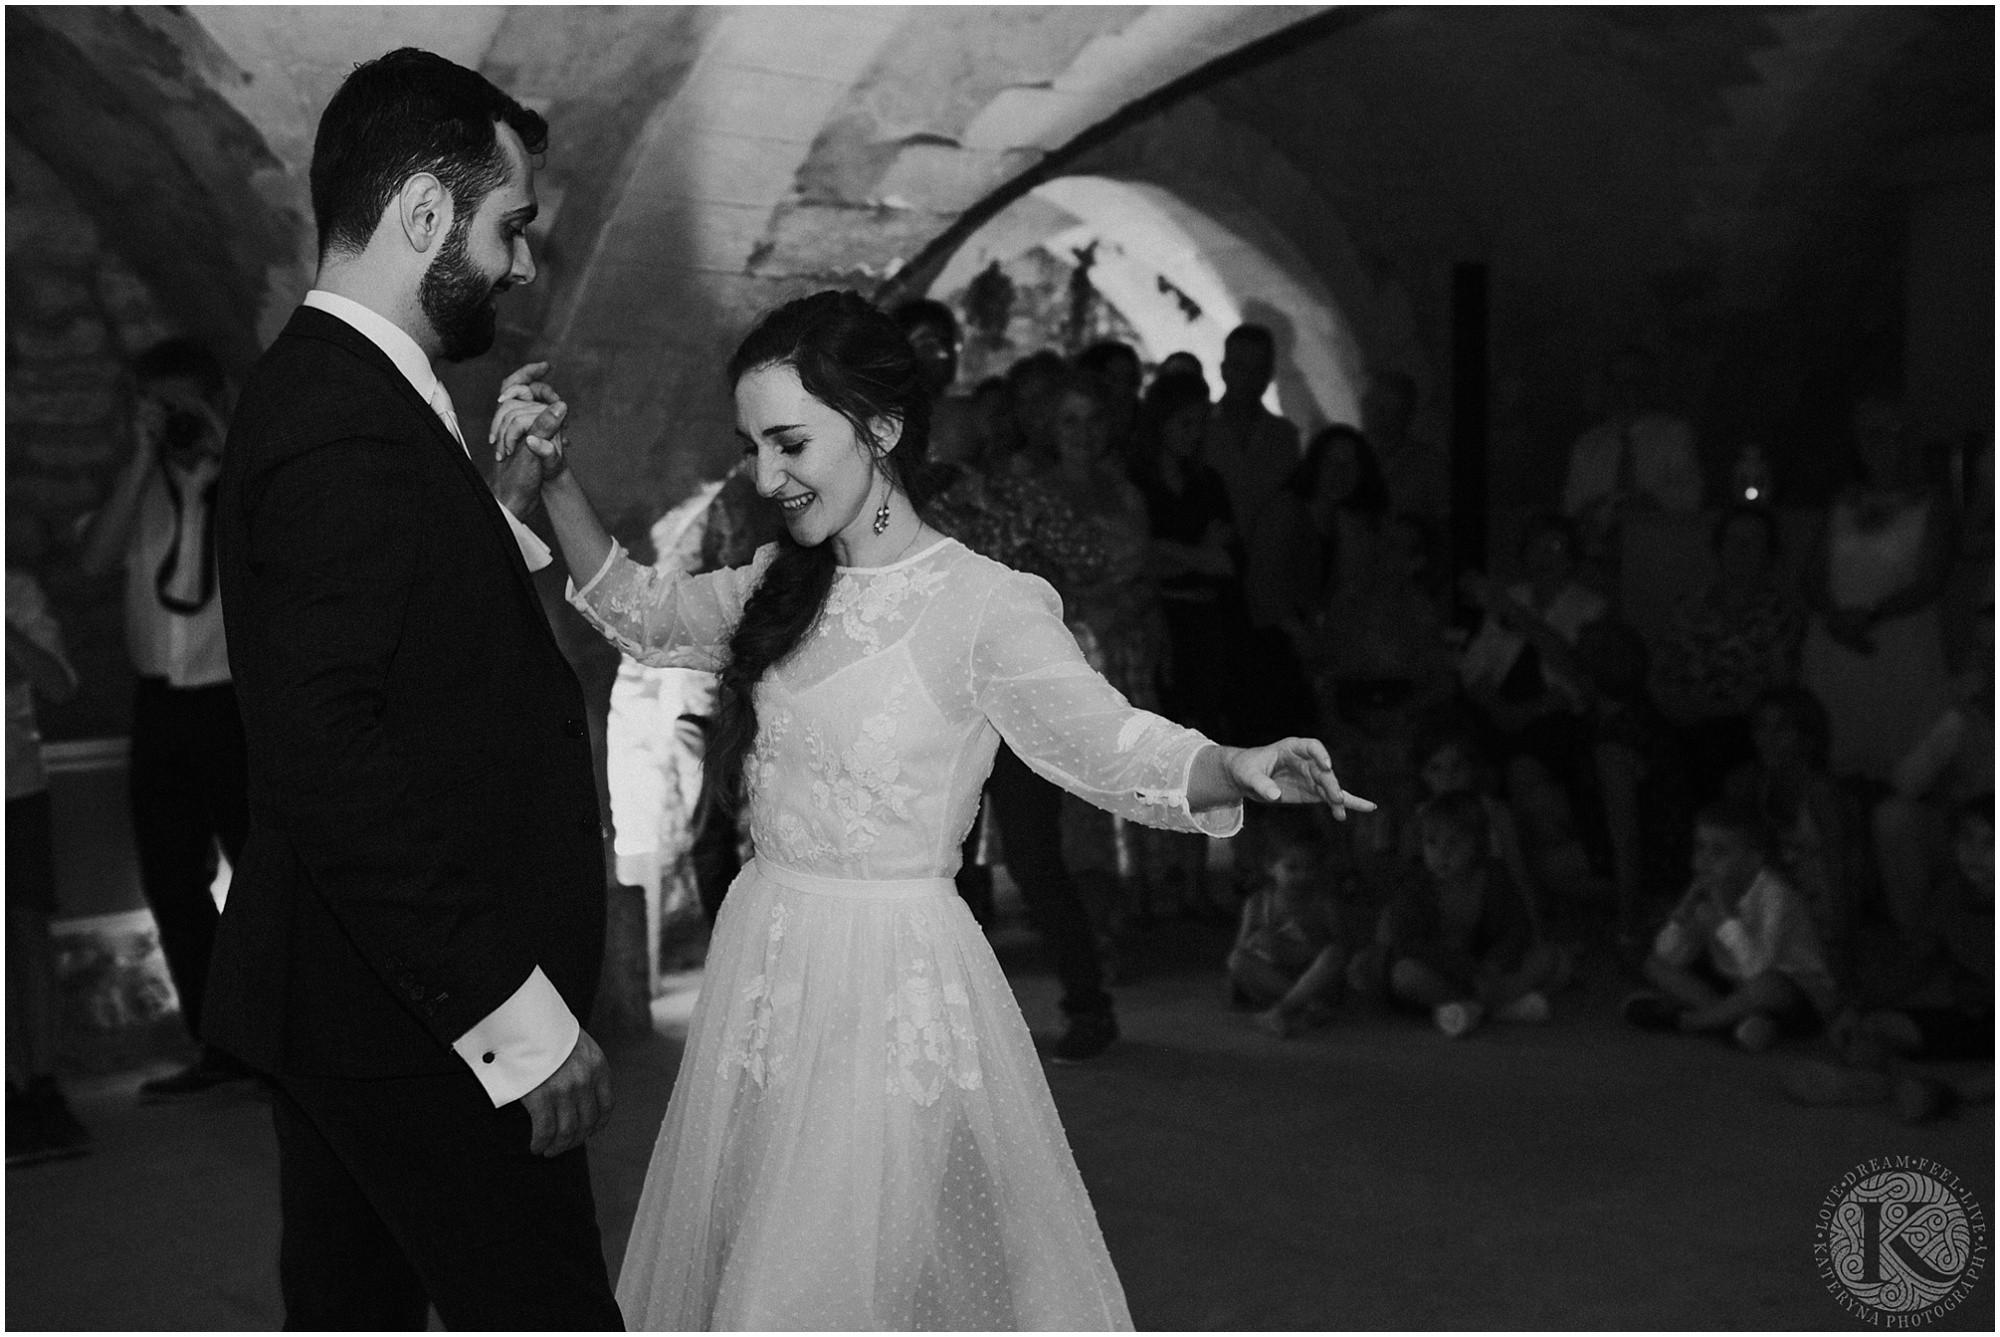 Kateryna-photos-photographe-mariage-vaucluse-provence-avignon-ferme-st-hugues_0098.jpg